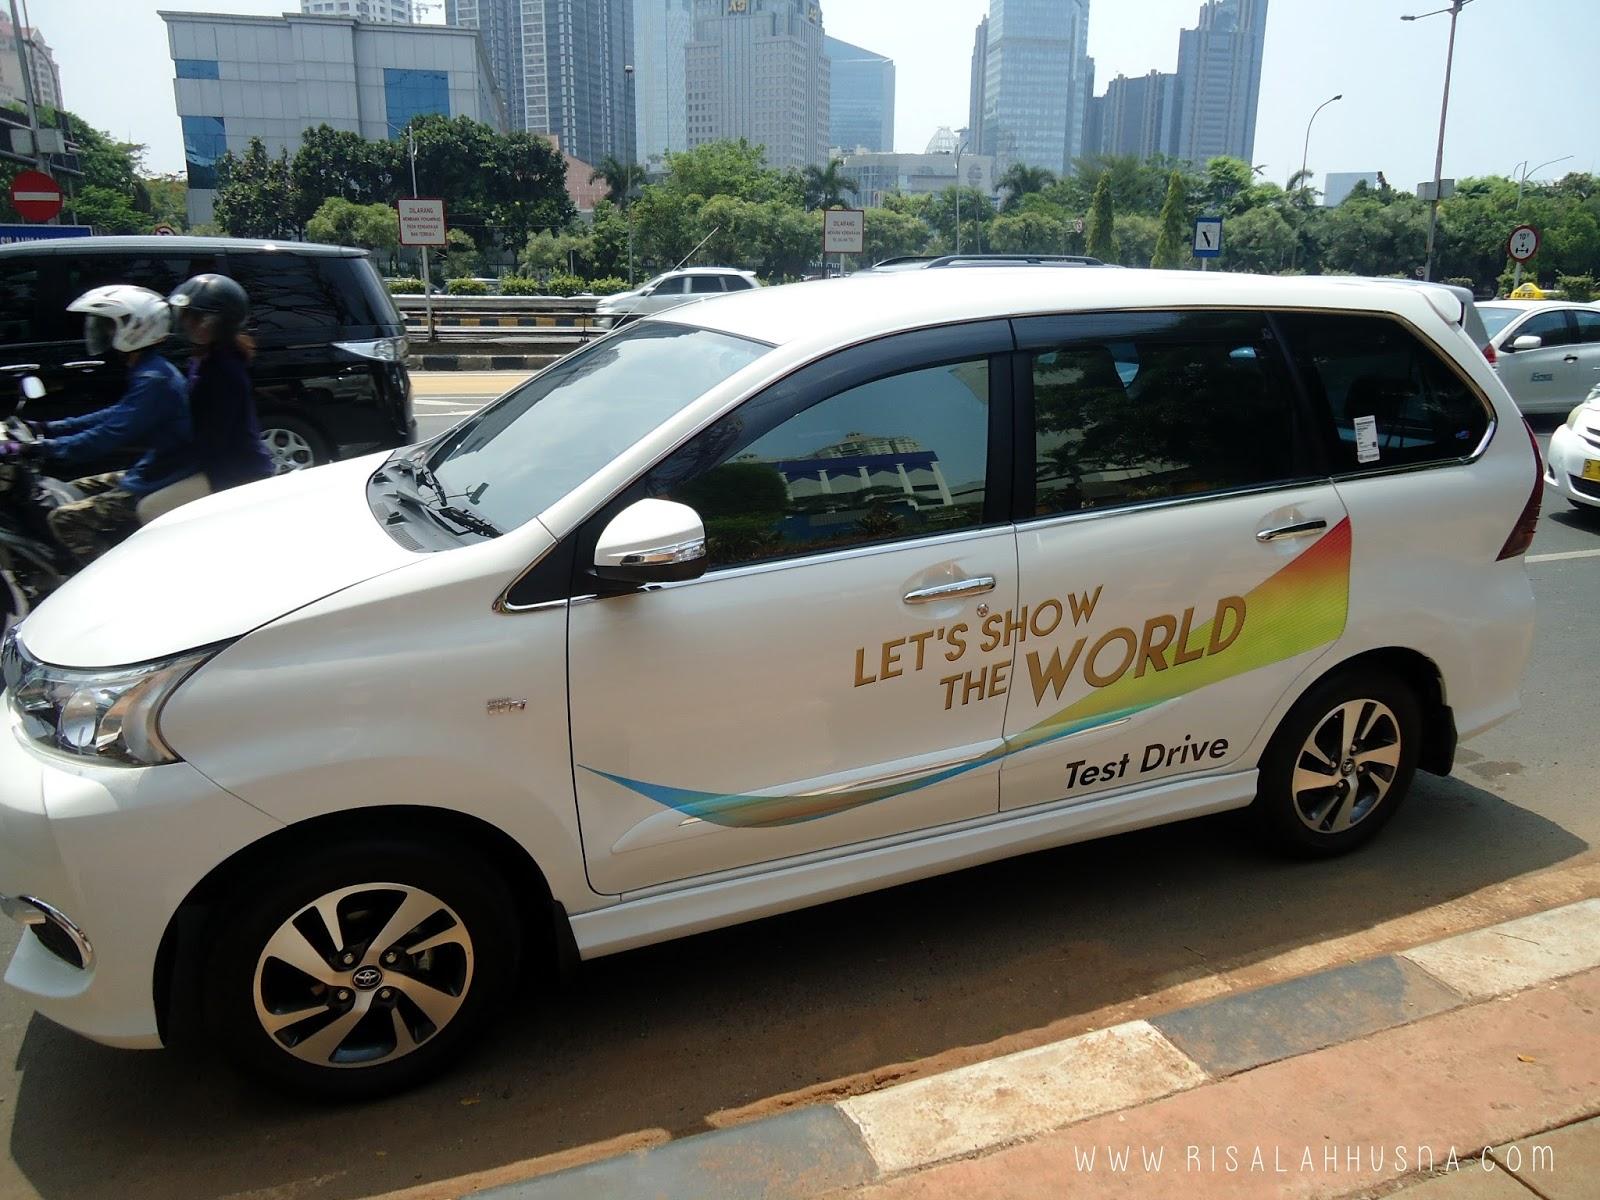 Grand New Veloz Putih All Toyota Alphard 2019 Risalah Husna One Day Challenge Ke Ah Poong Sentul Bersama Teman Saya Selama